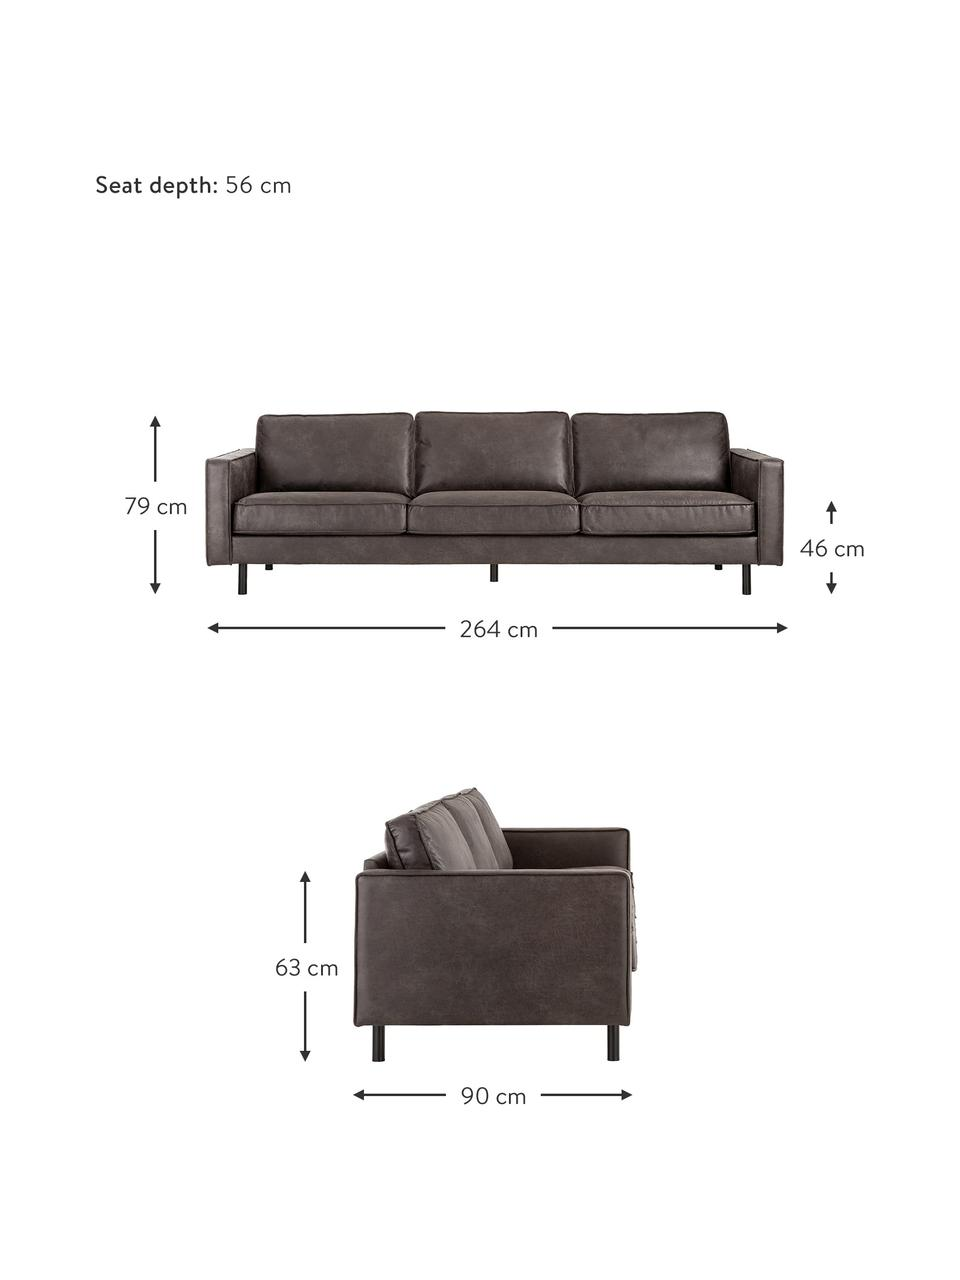 Sofa Hunter (4-Sitzer) in Braungrau aus recyceltem Leder, Bezug: Recyceltes Leder (70% Led, Gestell: Massives Birkenholz und h, Füße: Metall, pulverbeschichtet, Leder Braungrau, B 264 x T 90 cm